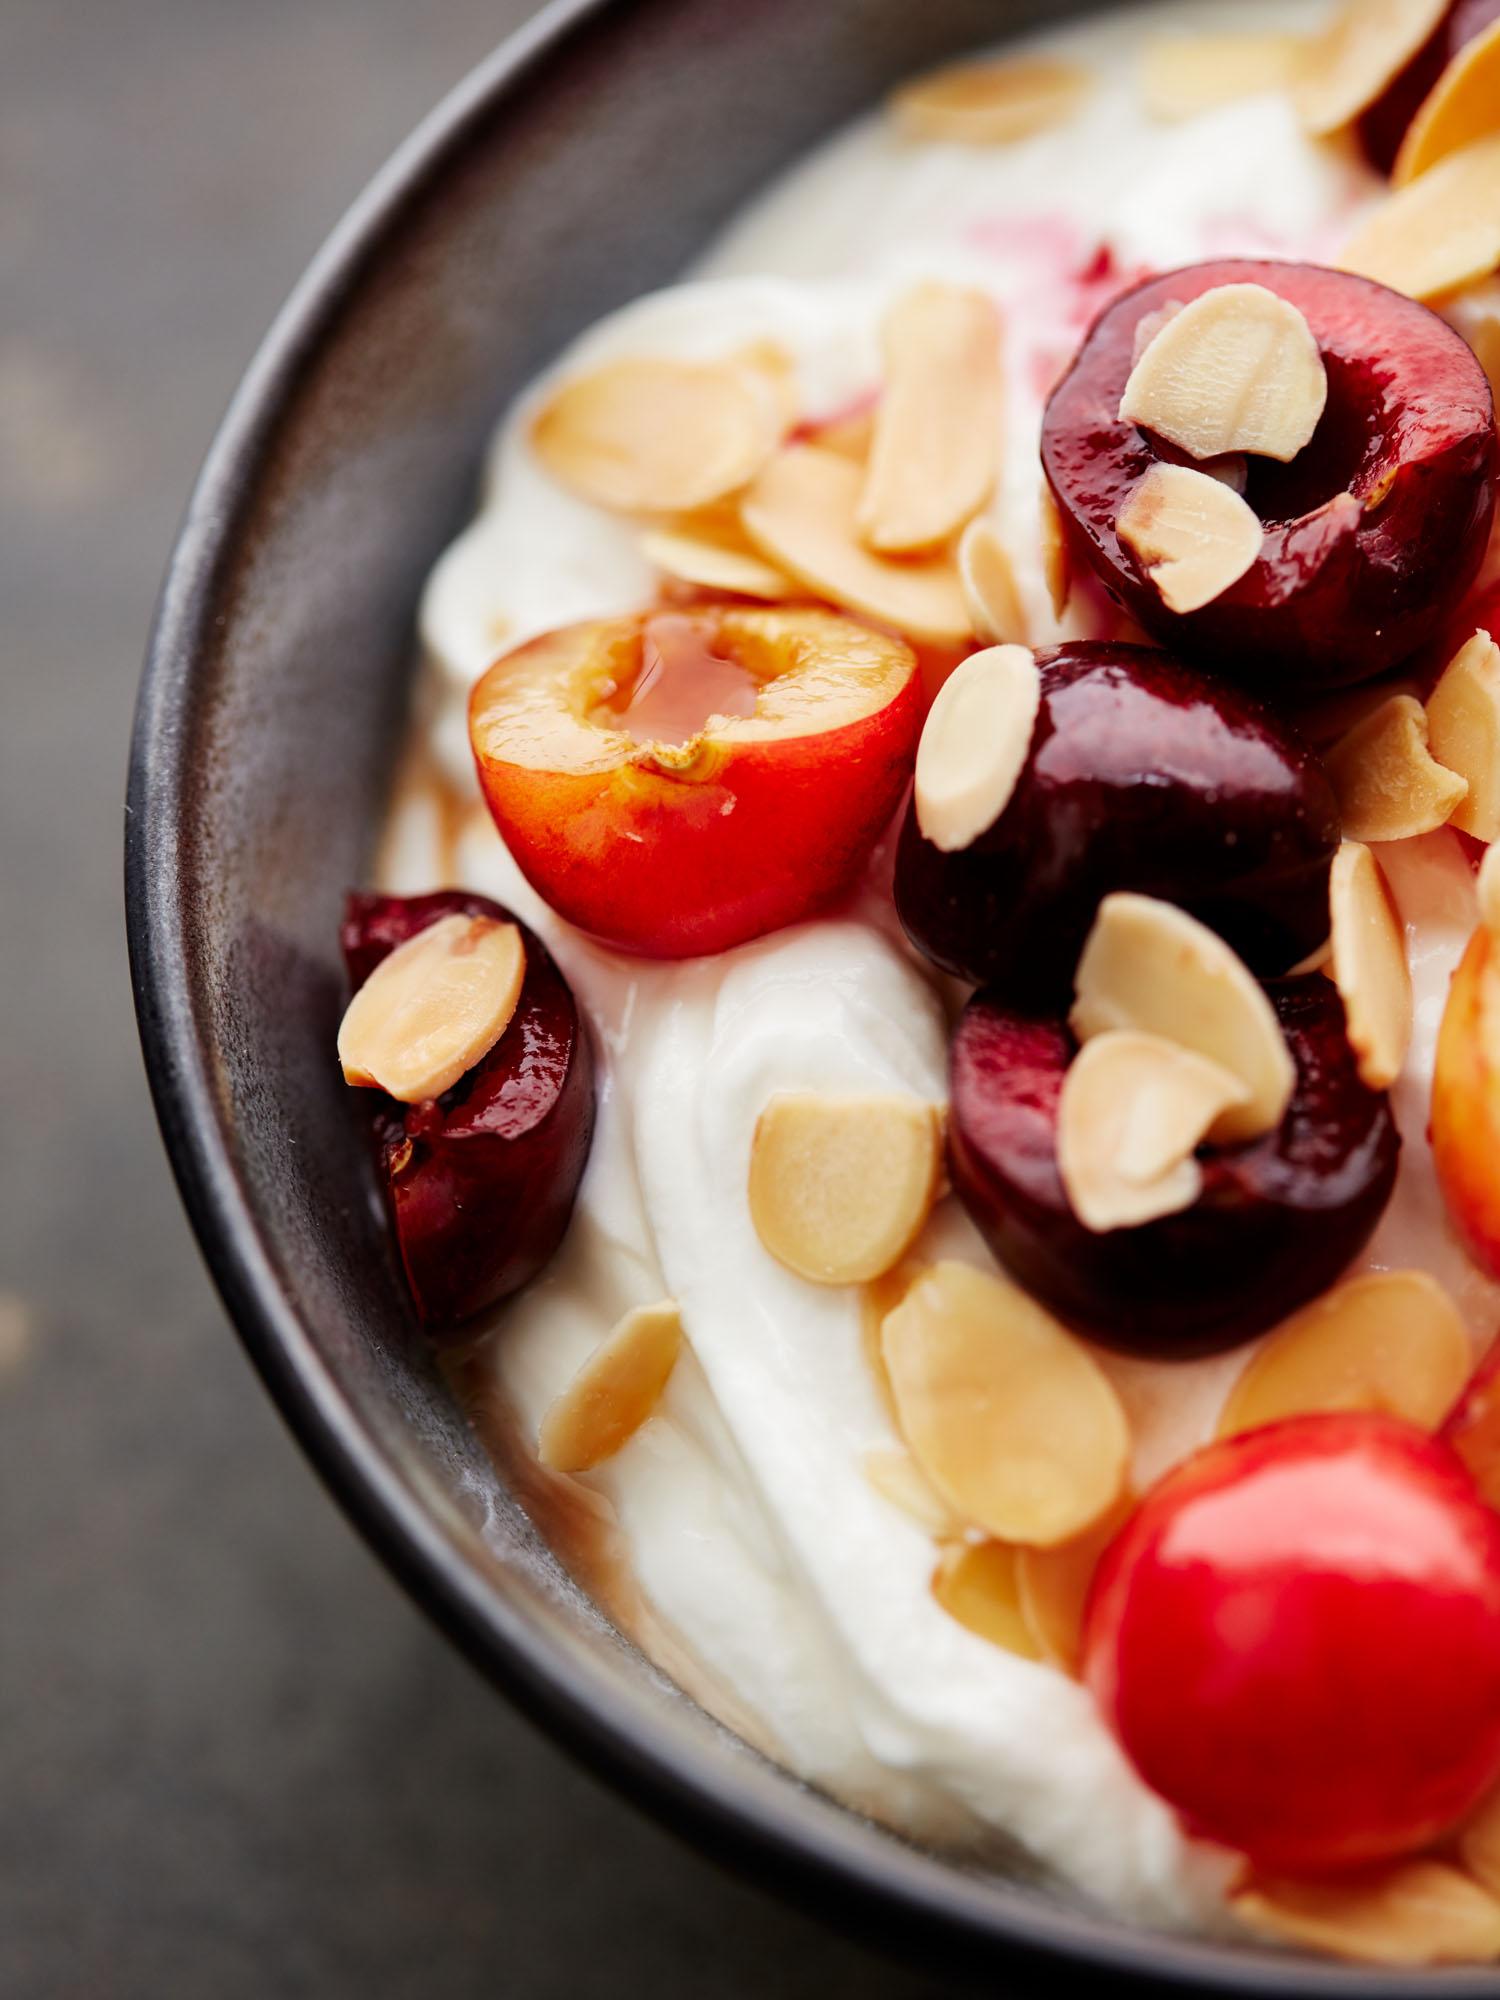 20160719_DrJulia_Yogurt-Cherries-Almonds054.jpg